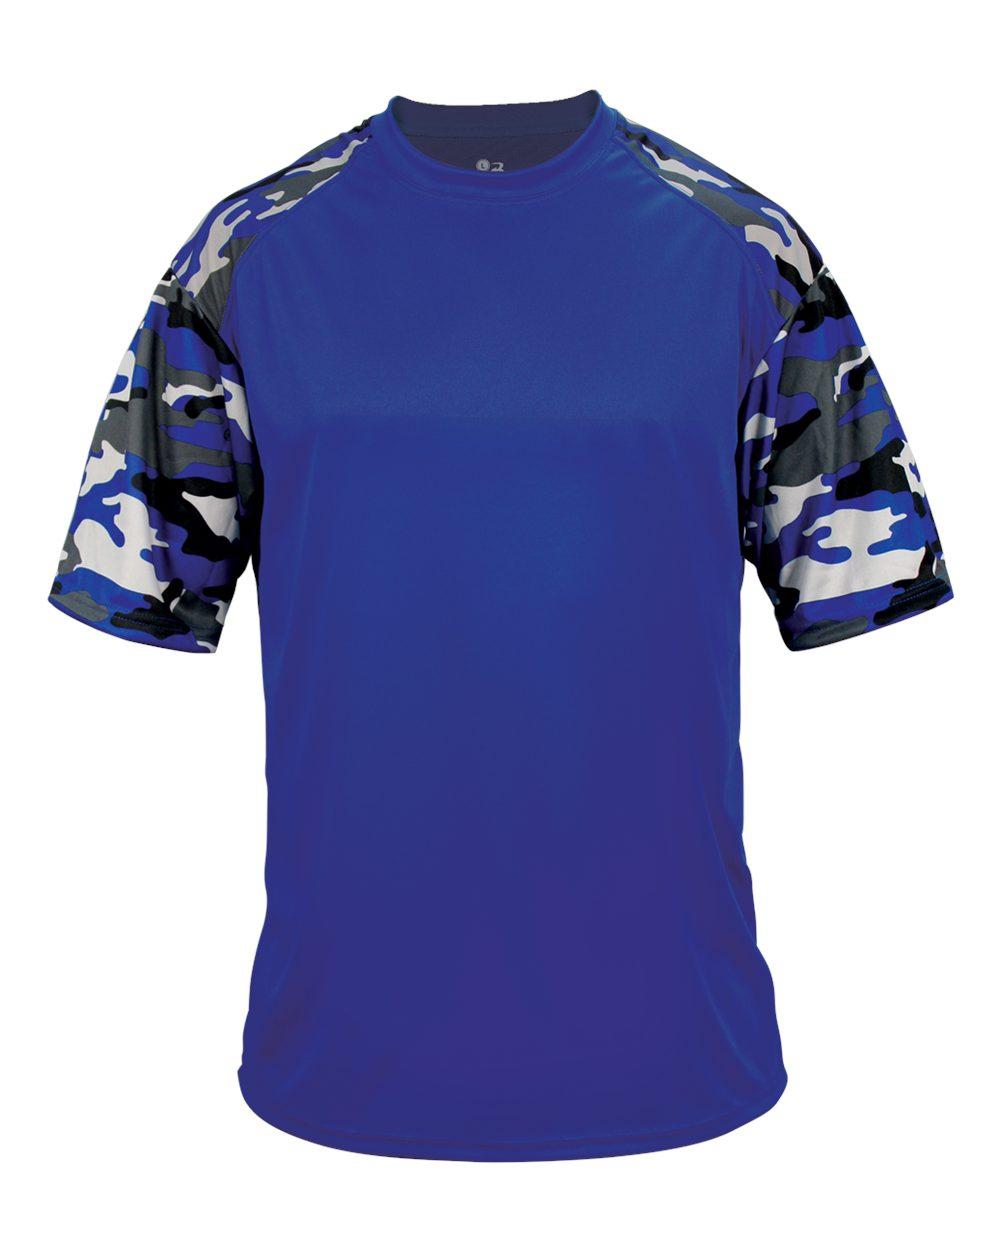 Badger Digital Camo Sport Youth Tee Shirt